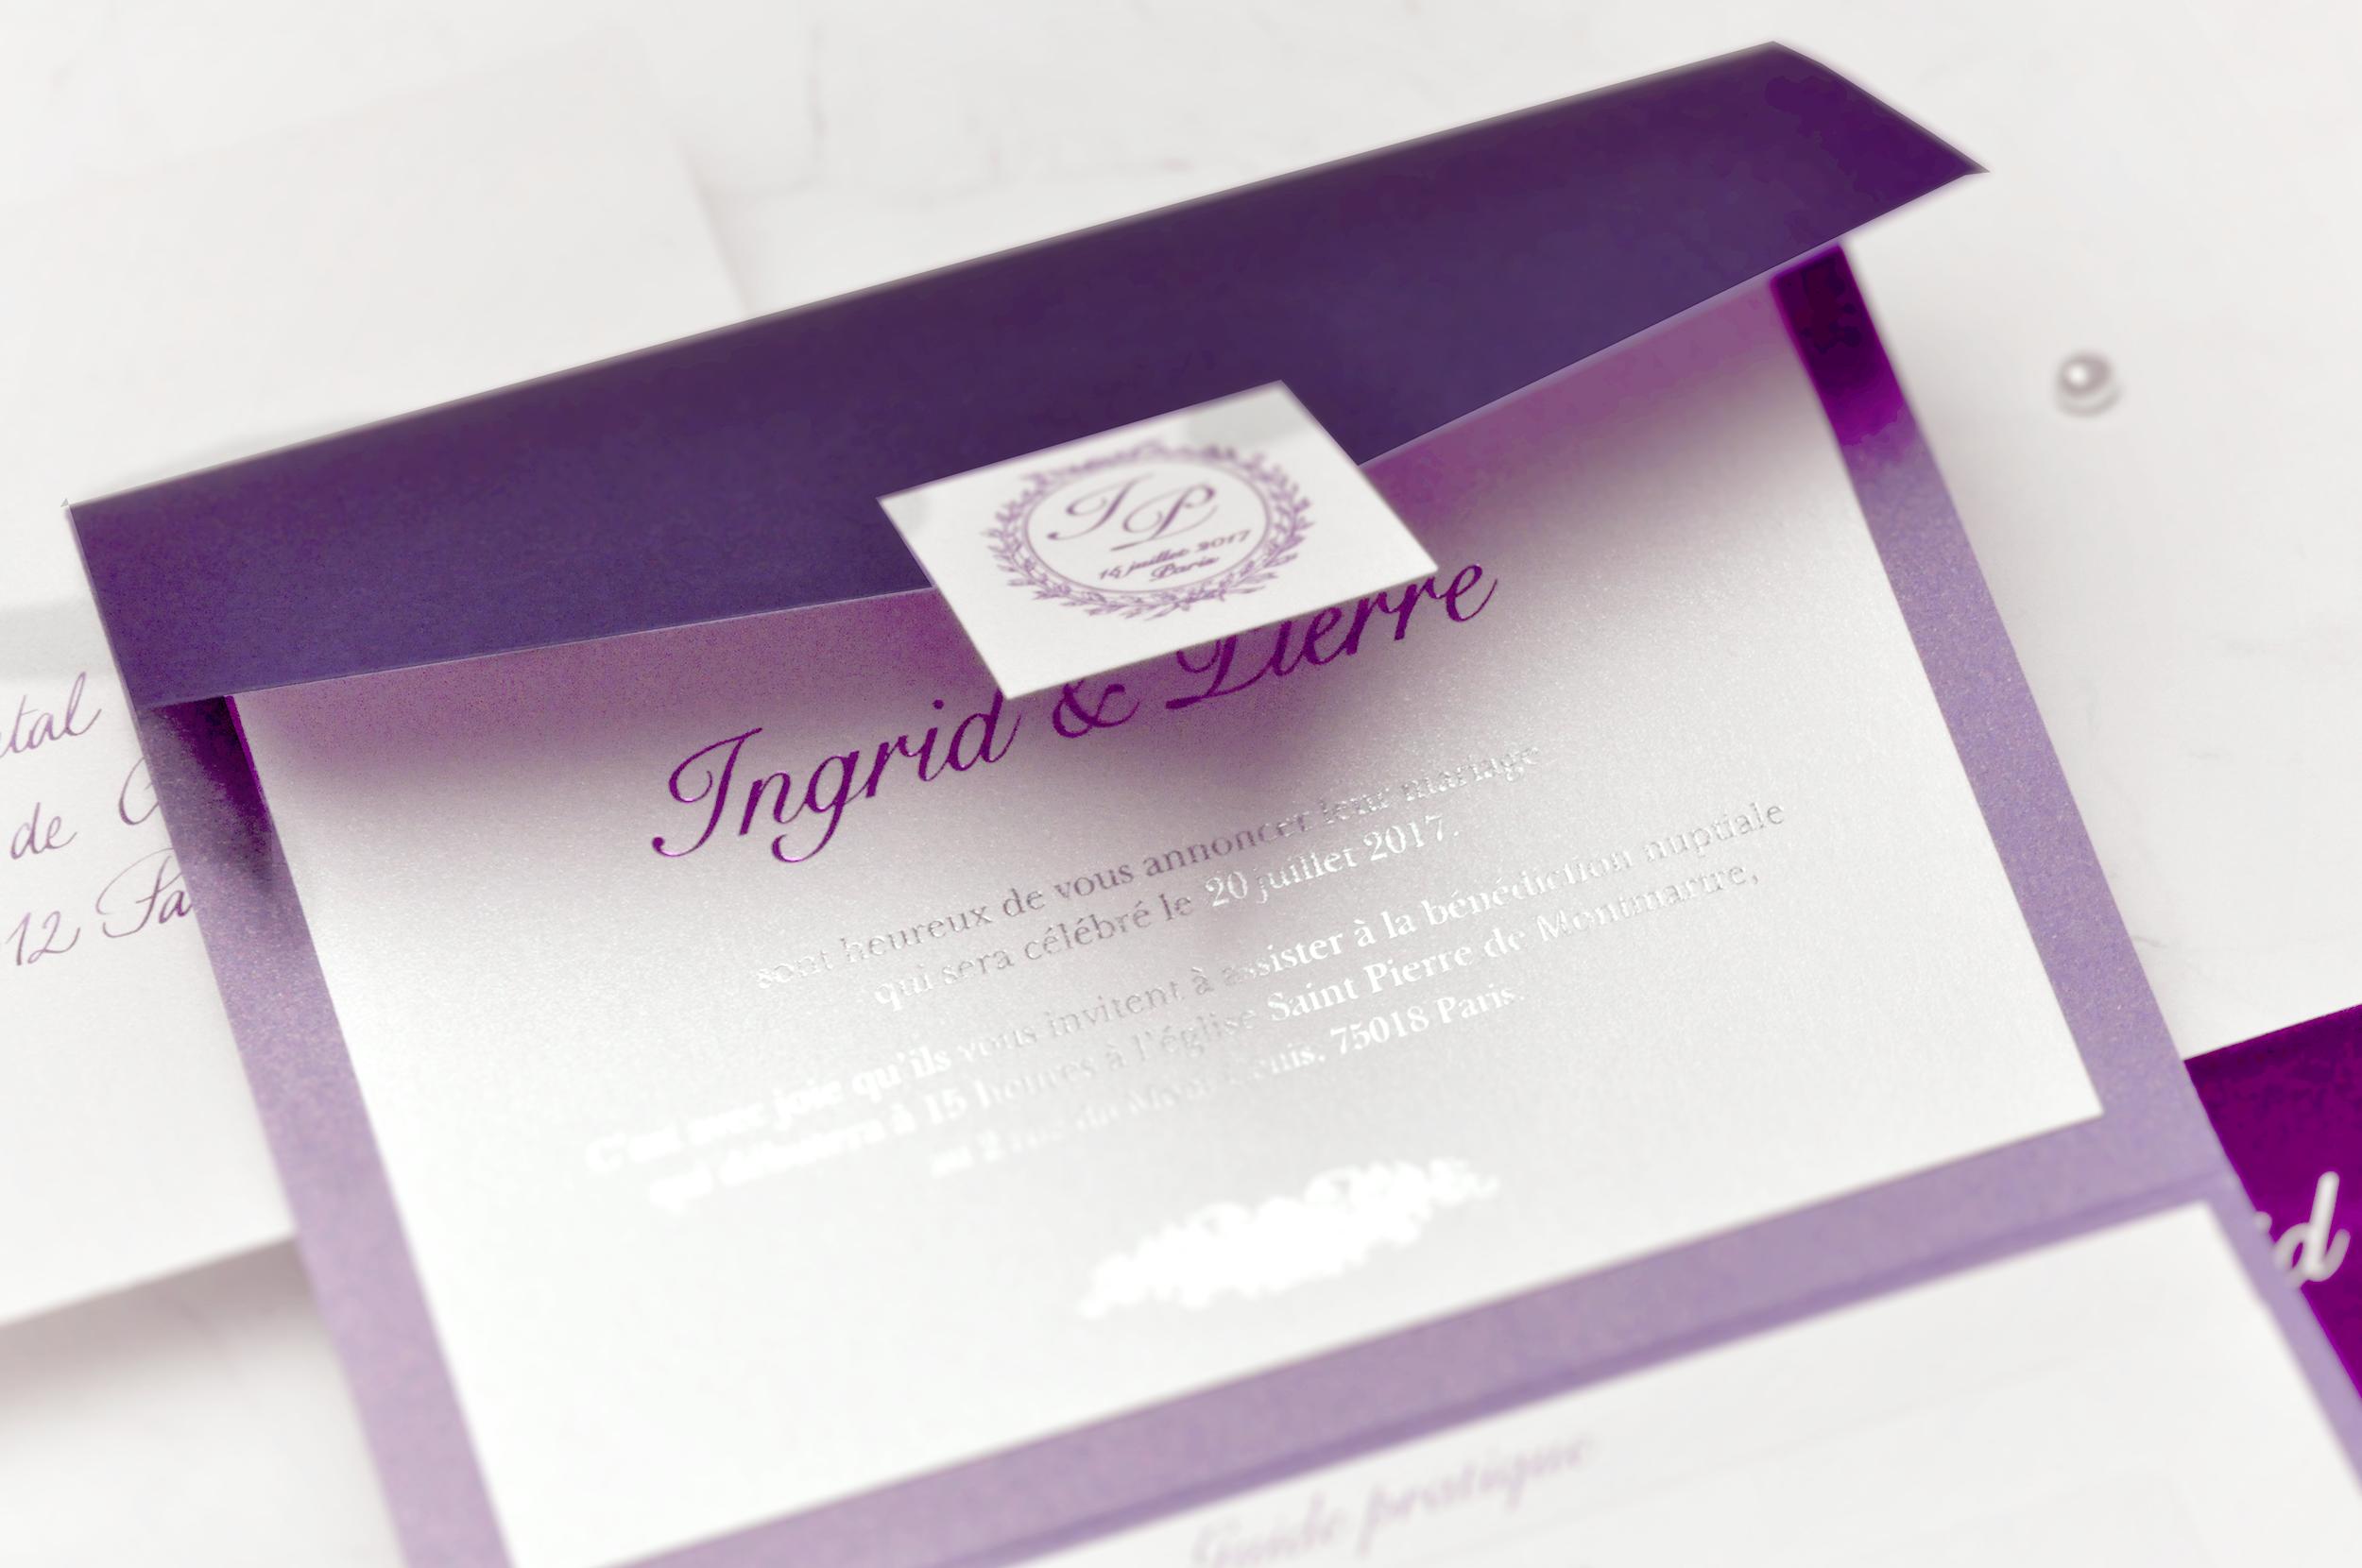 Ingrid Pierre 12 copie.png